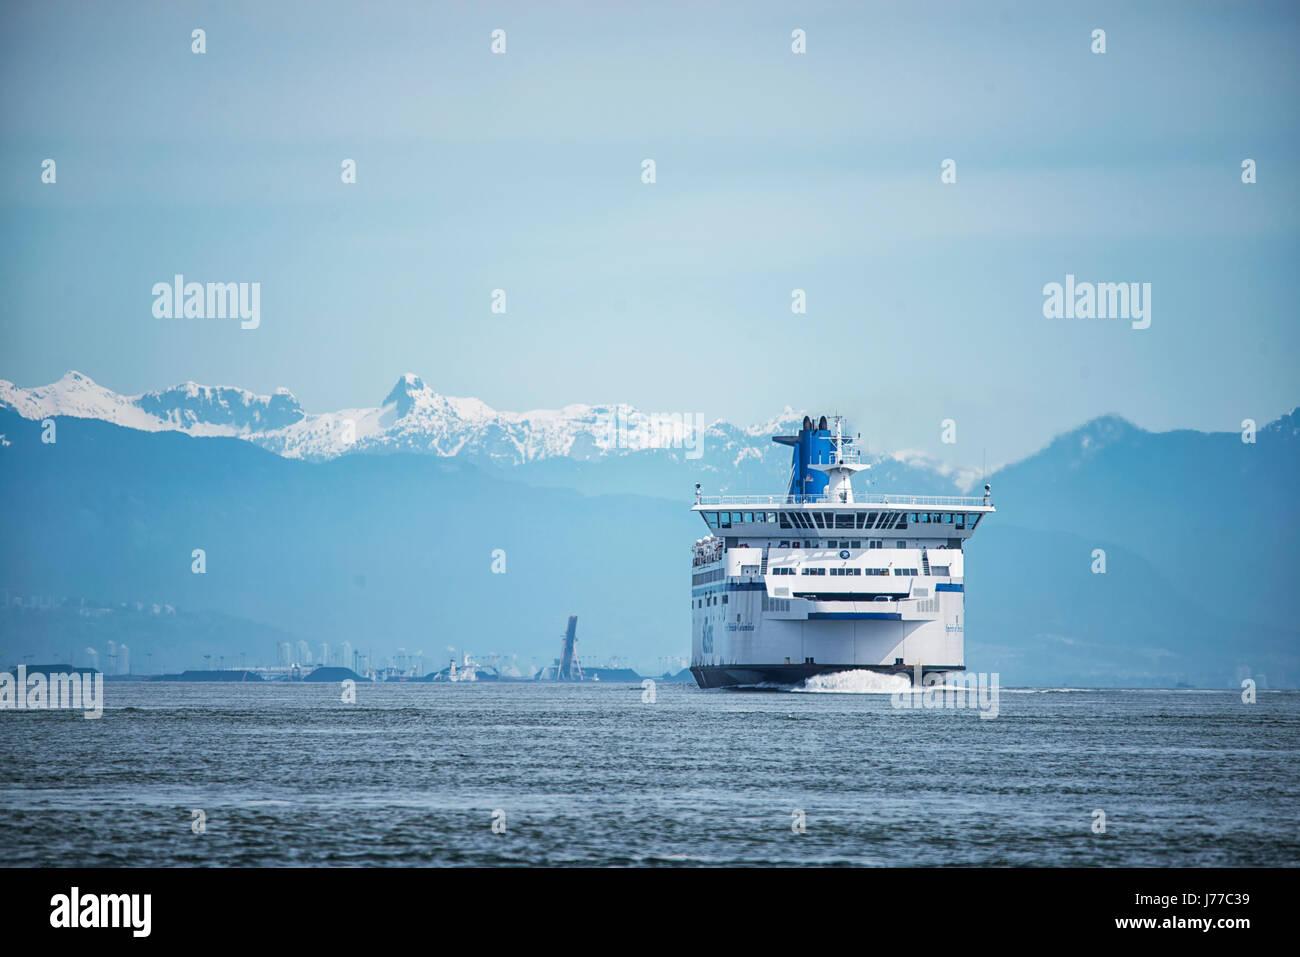 BC Ferries company passenger vessel Spirit of British Columbia sailing near to Galiano Island 3. - Stock Image